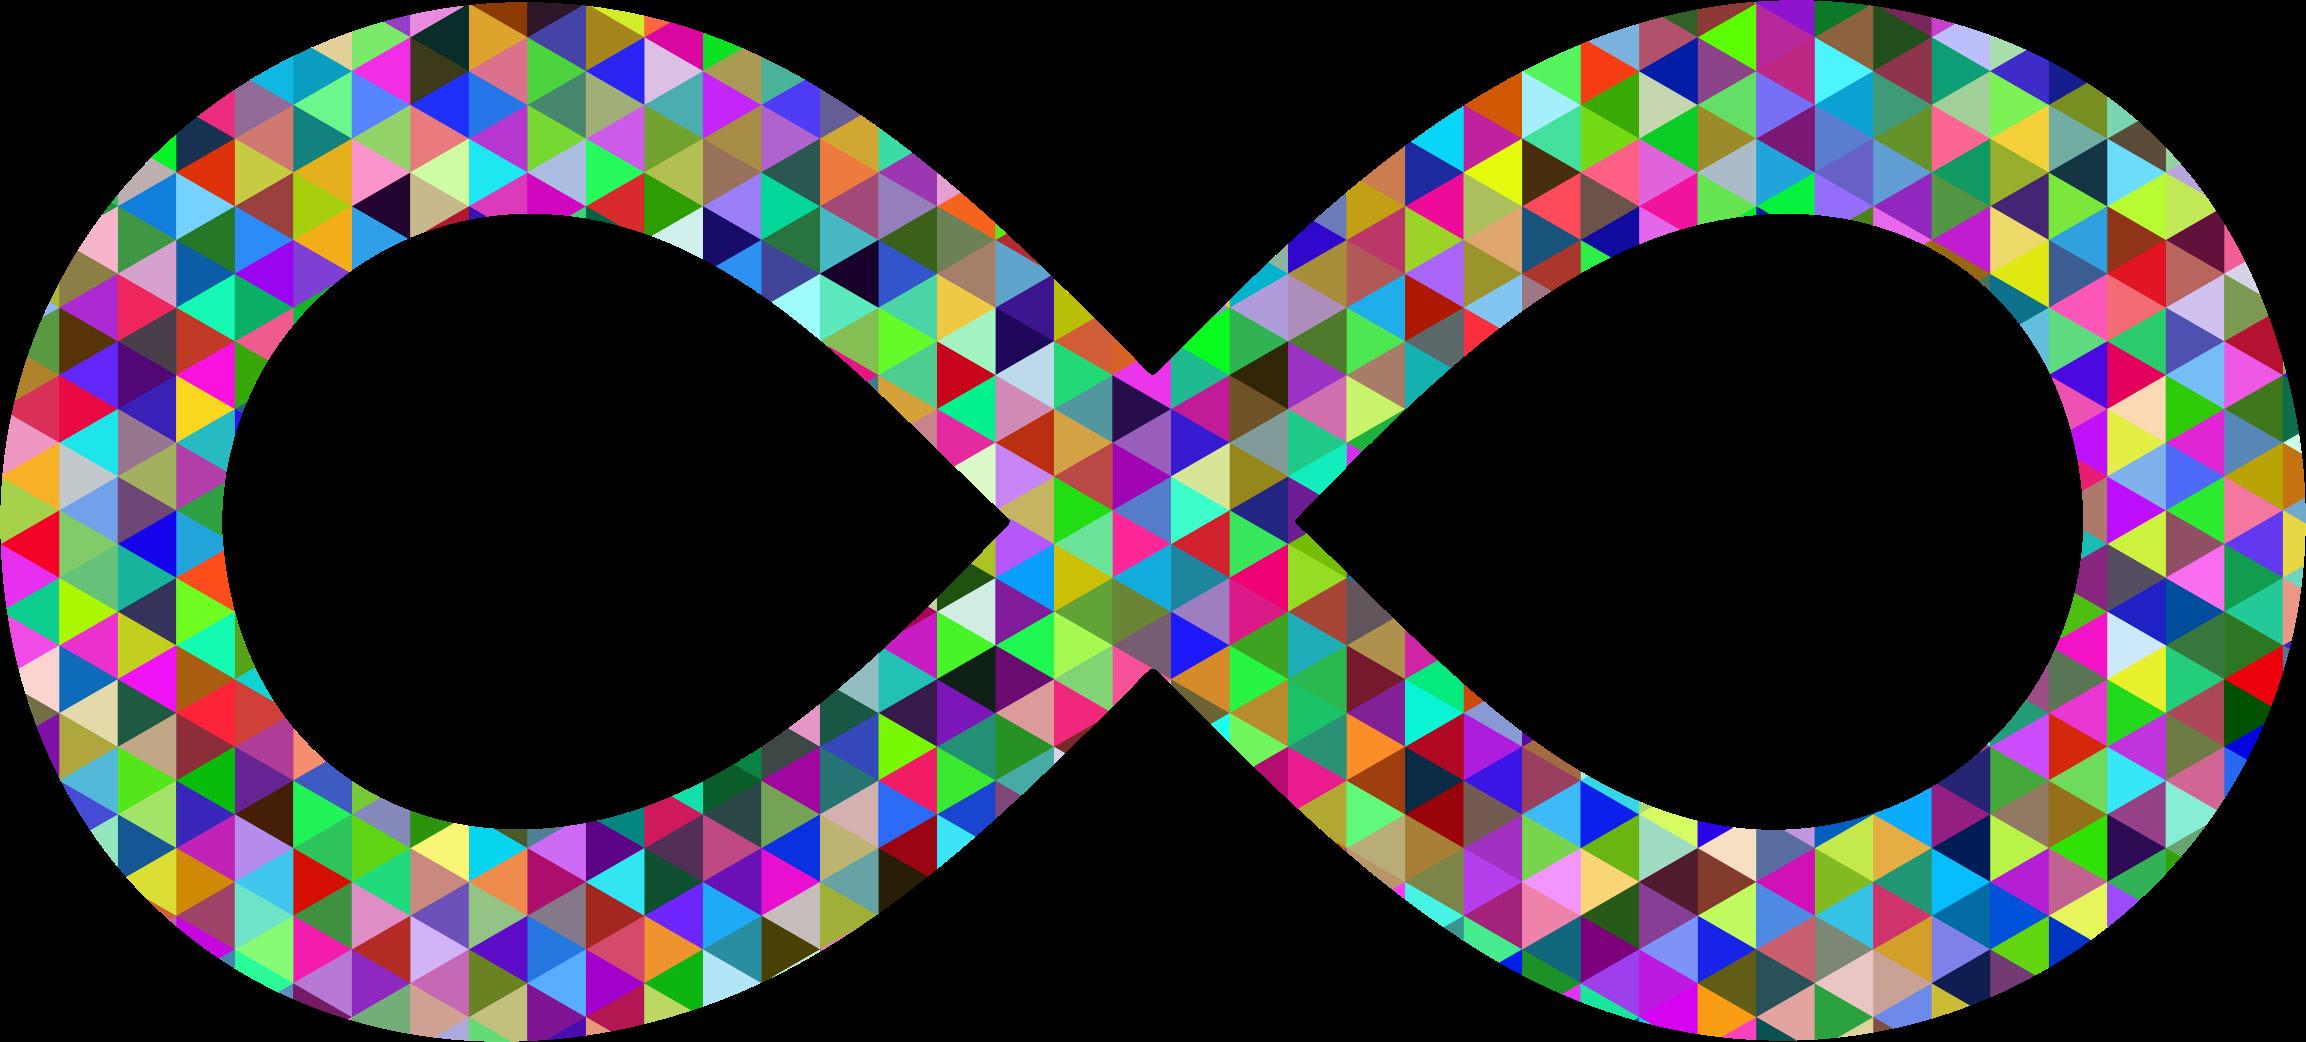 Infinity clipart infinity sign Triangular Triangular Clipart Prismatic Prismatic